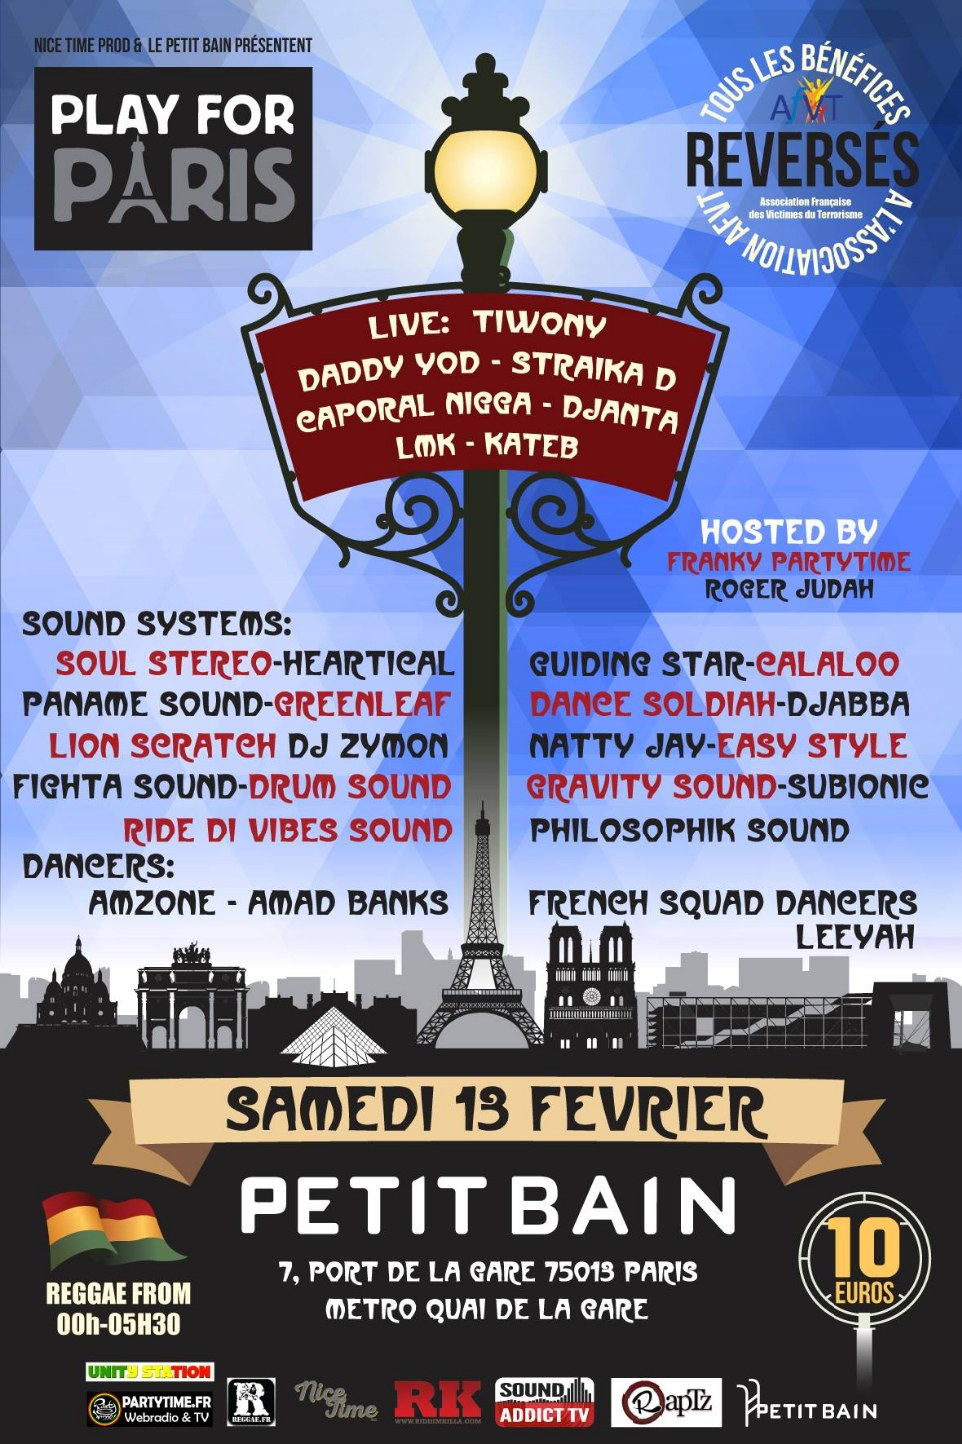 PLAY FOR PARIS 13 FEV 2016 PETIT BAIN